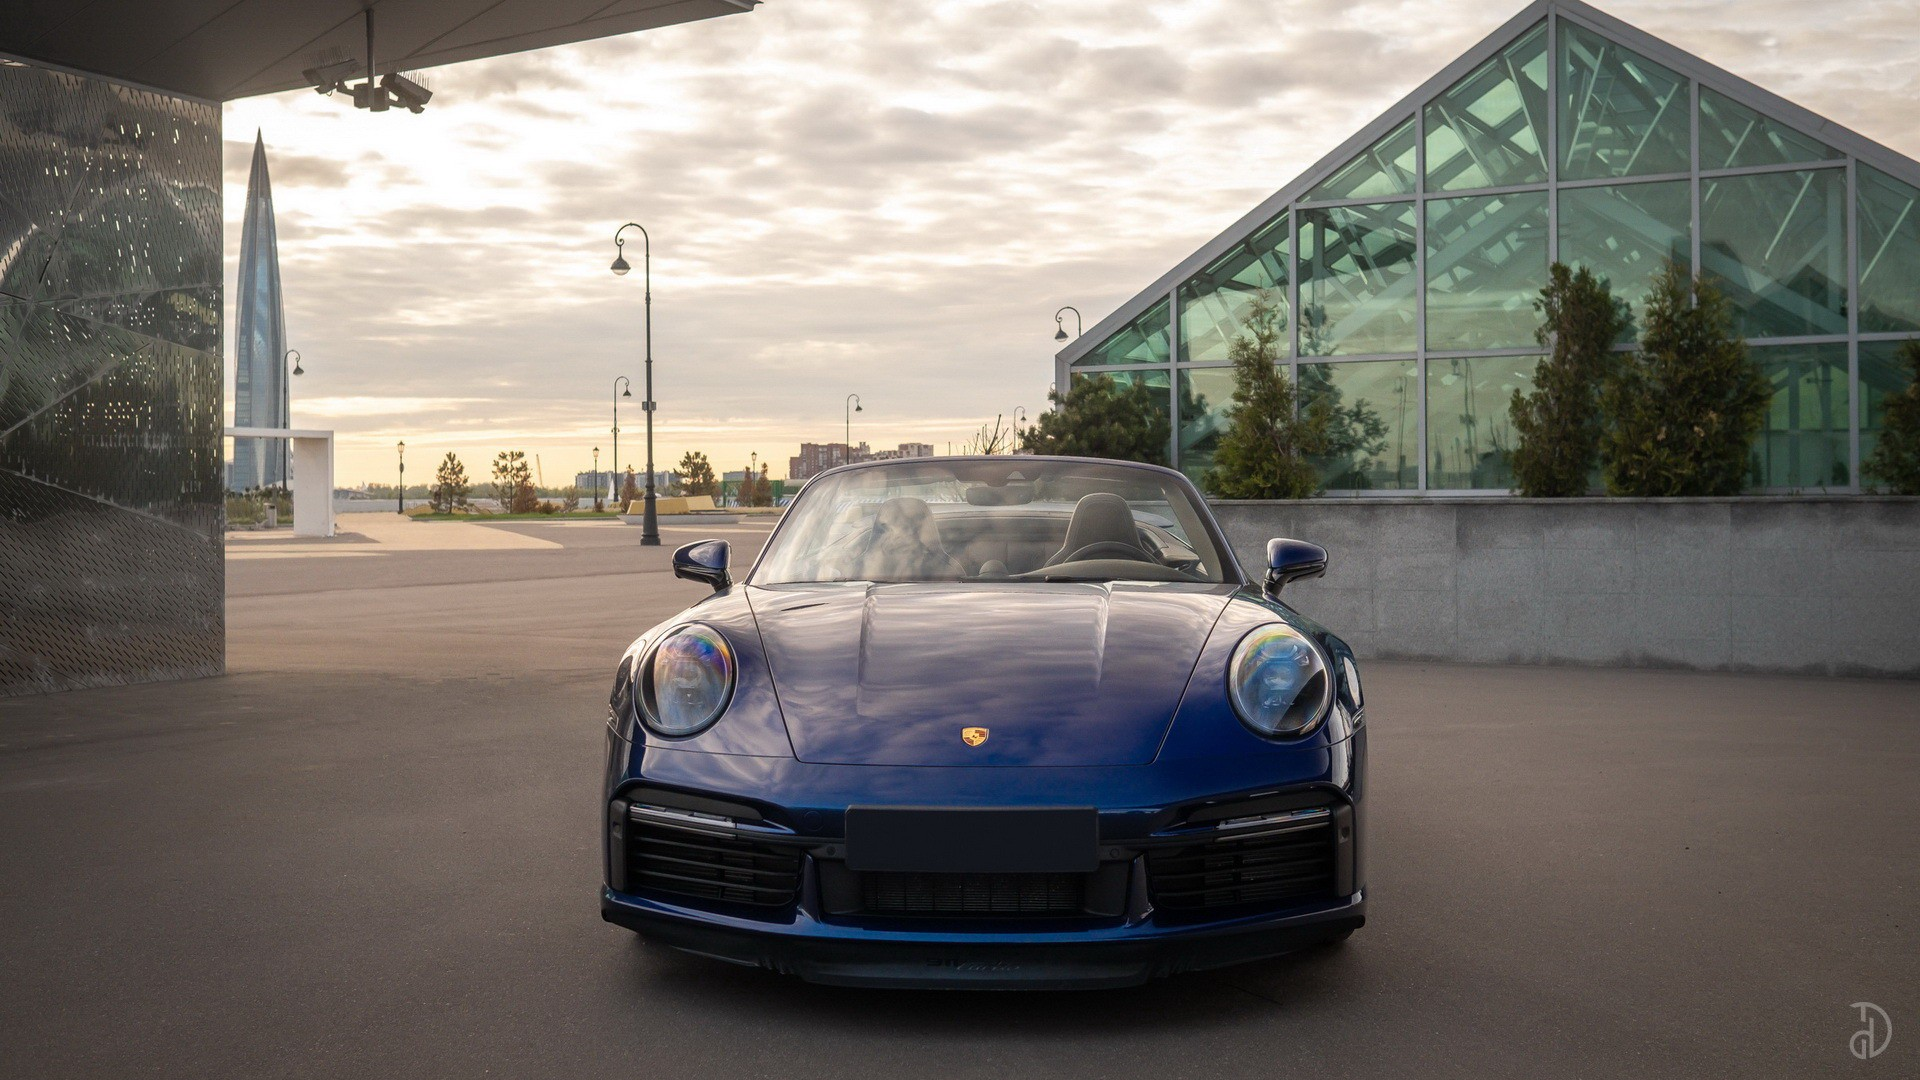 Аренда Porsche 911 Turbo (992) в Сочи. Фото 2